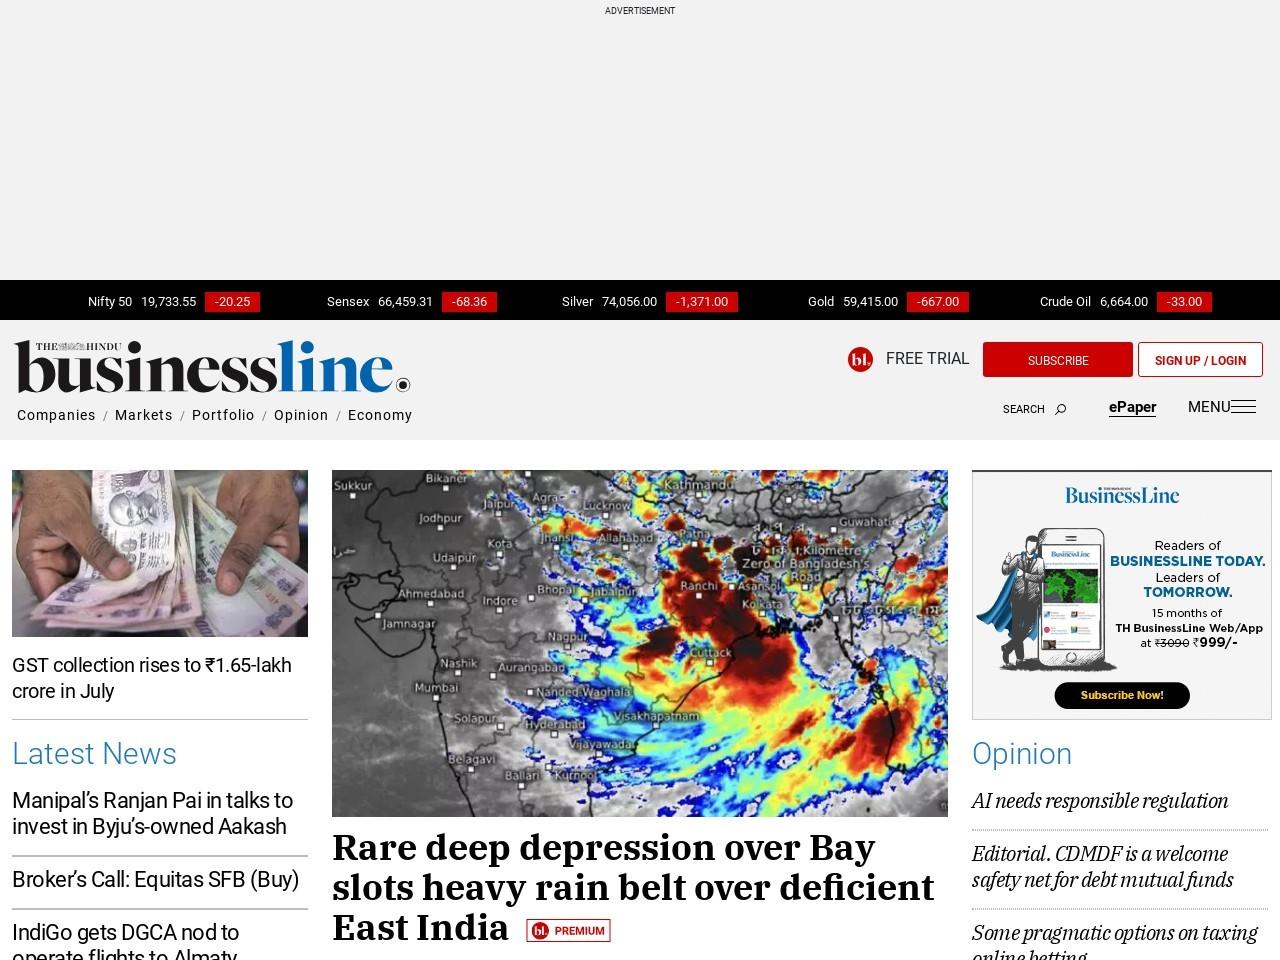 Why Rajalakshmi School of Business will focus on marketing